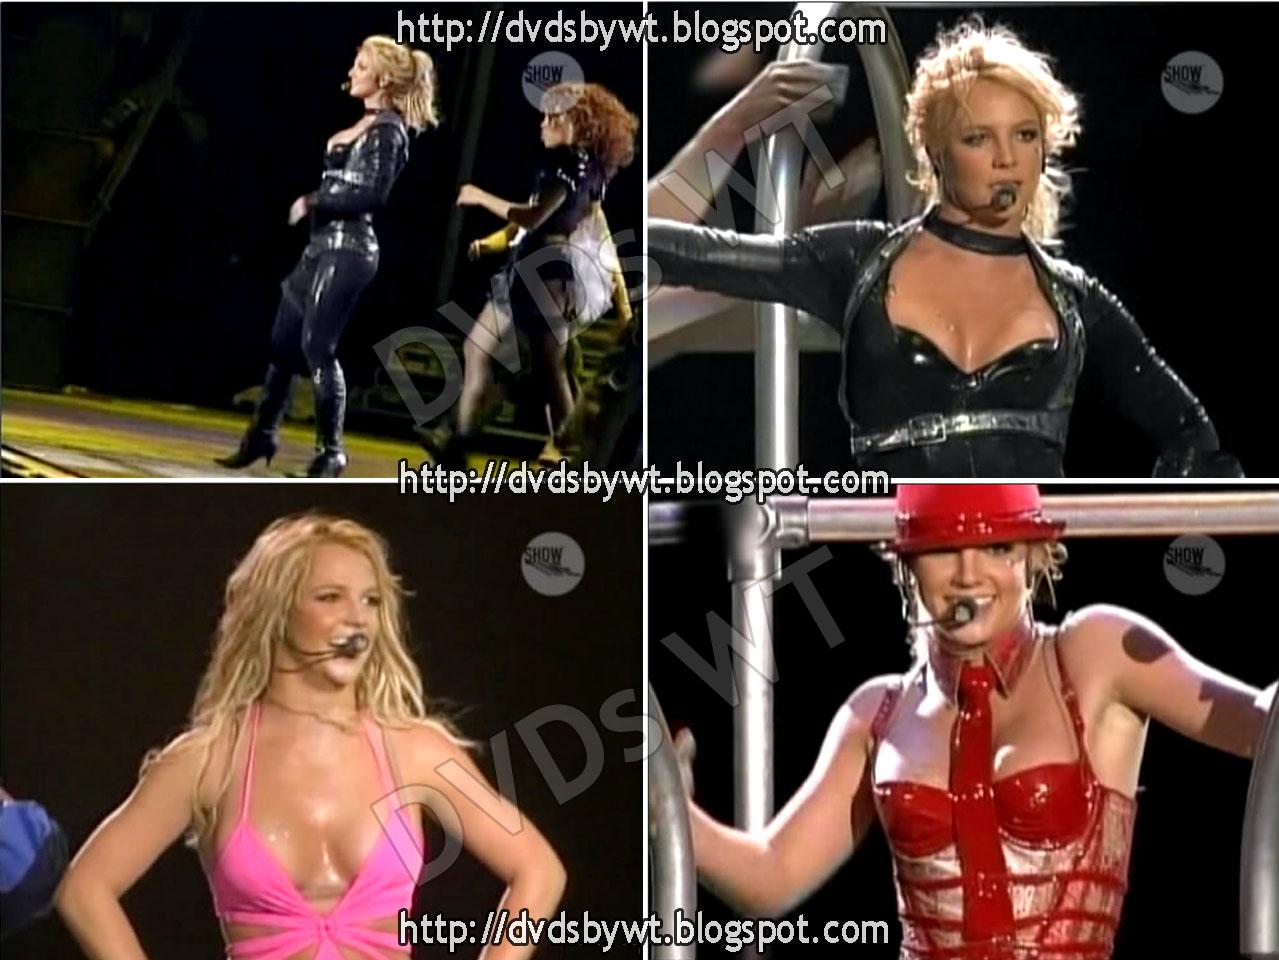 http://2.bp.blogspot.com/-OXfMo9KJaRo/T8jNfs3TXmI/AAAAAAAAGD4/mUMQCIHlQHg/s1600/Britneyonyxcaps2.jpg